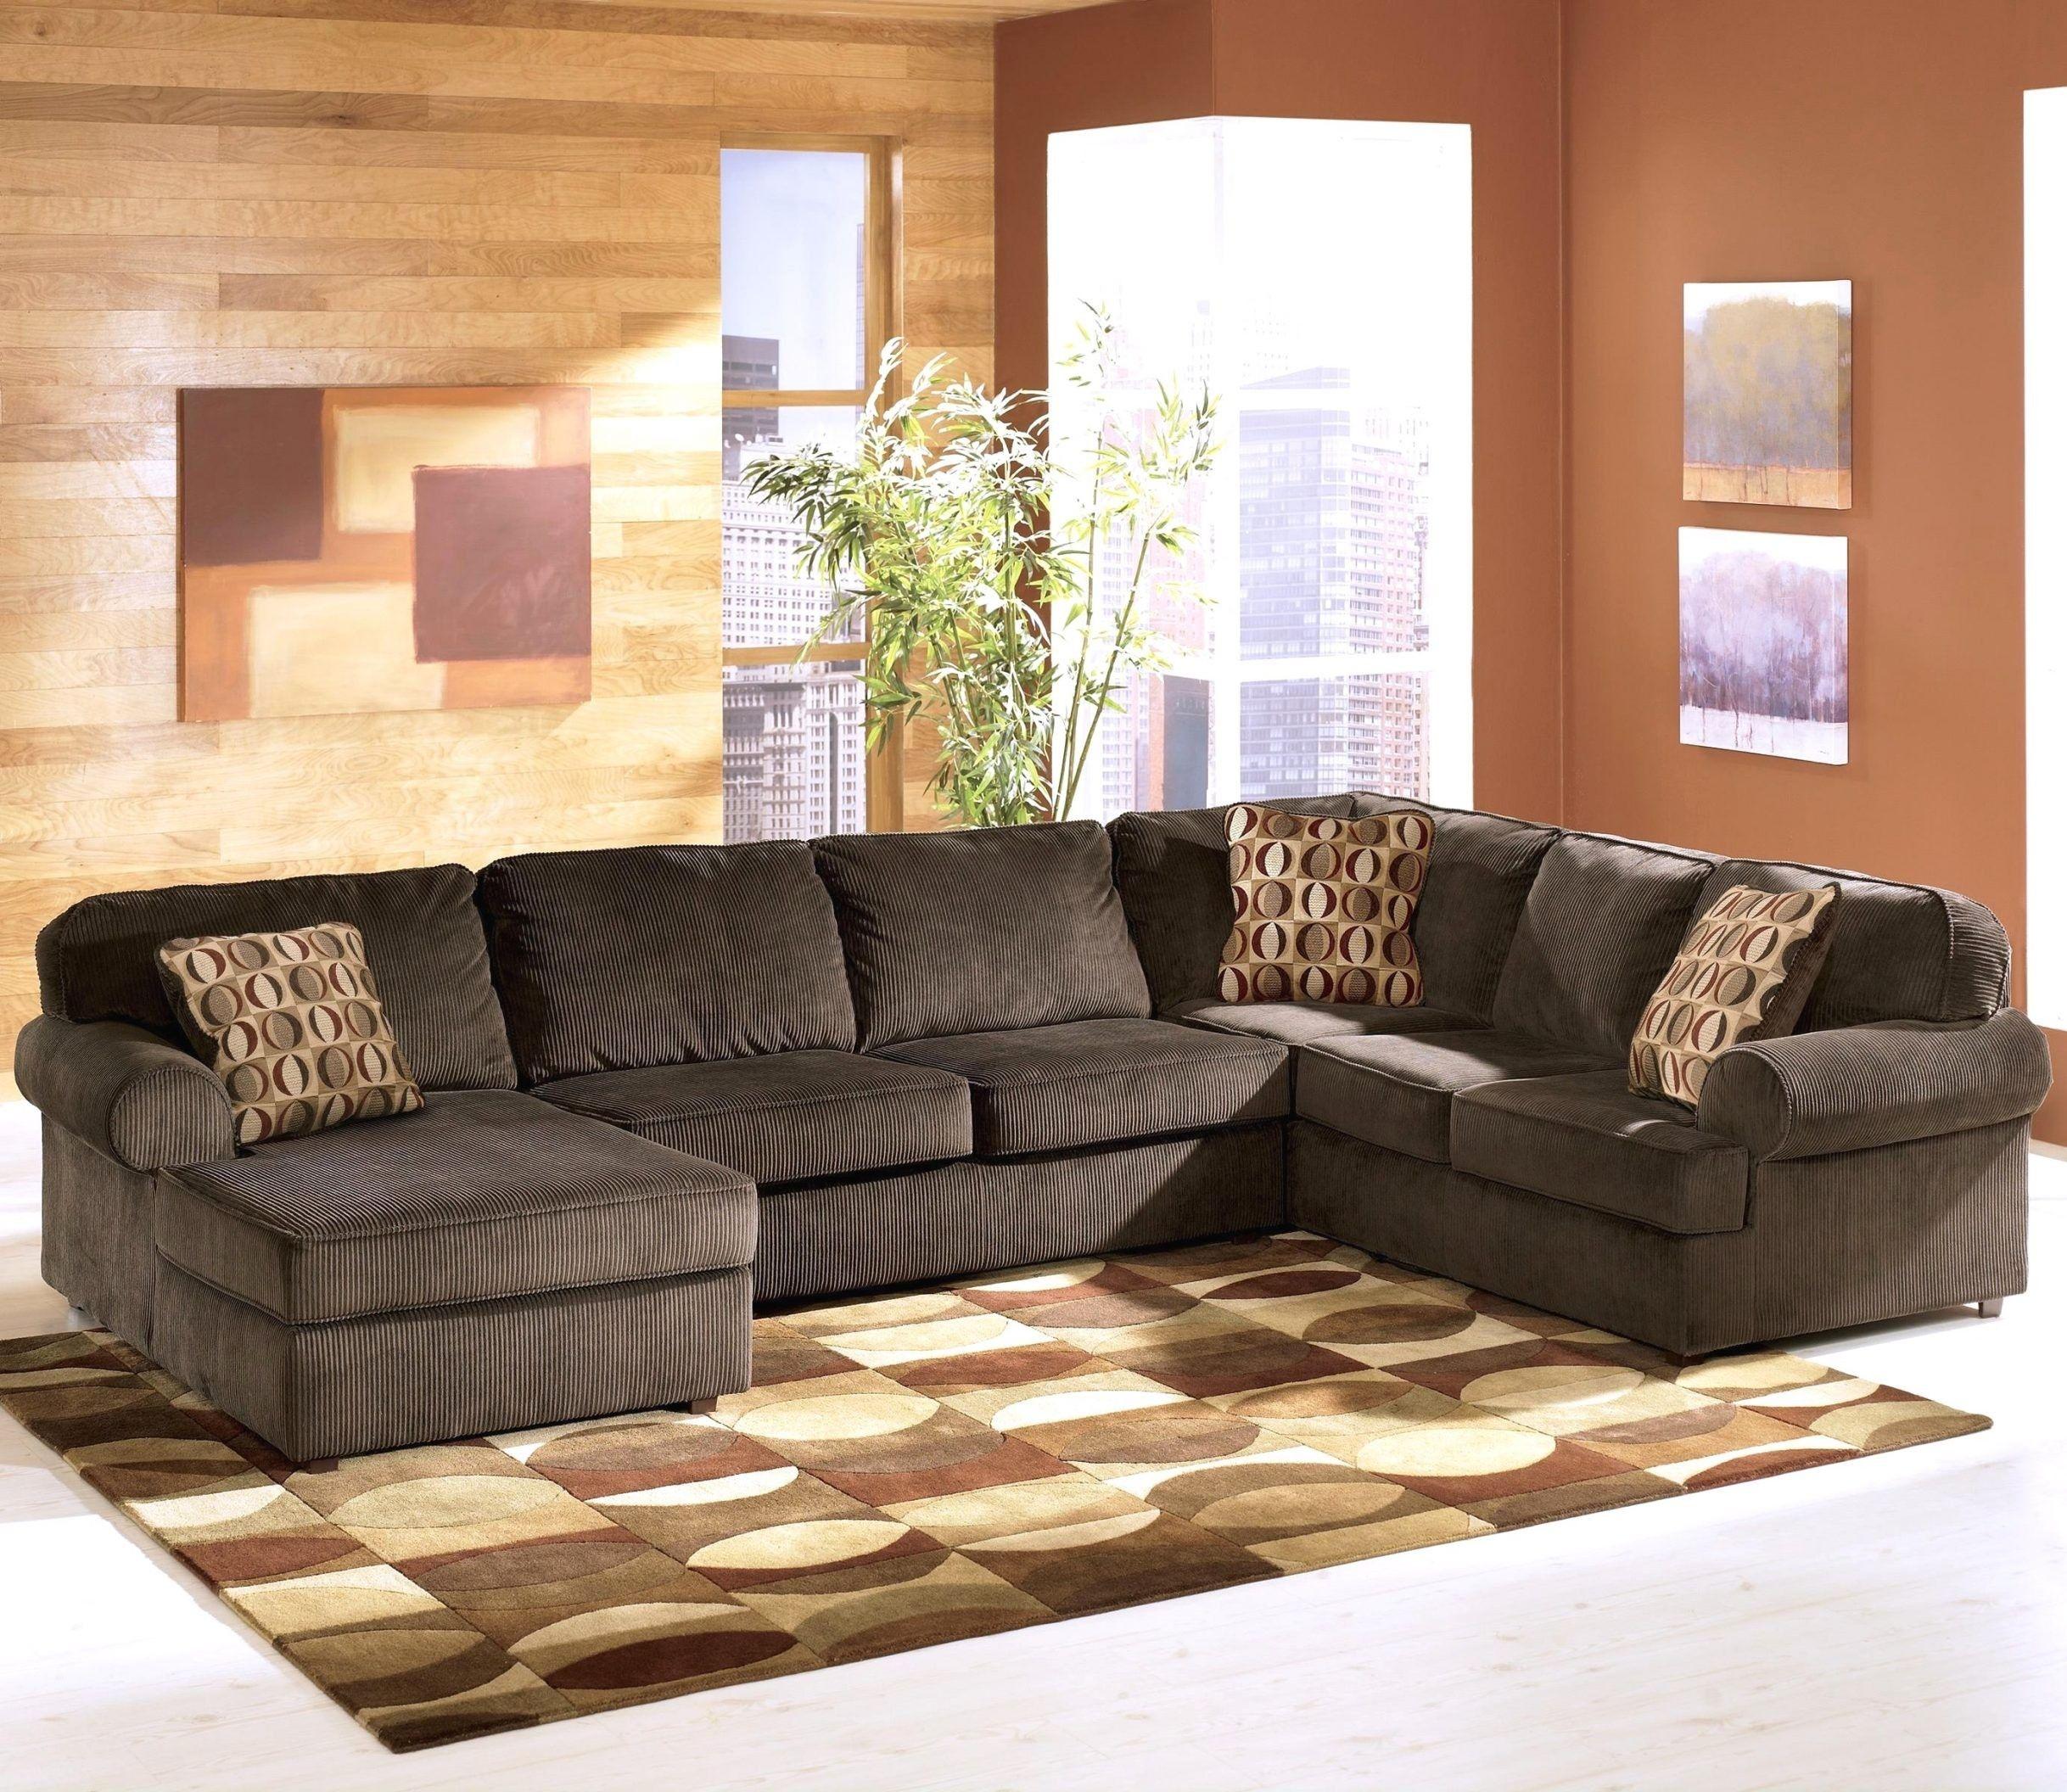 Ashley Furniture Richfield Wi Ashley Furniture Salinas Ca 8 Intended For Ashley Furniture Milwaukee 32 Ashley Furniture Furniture